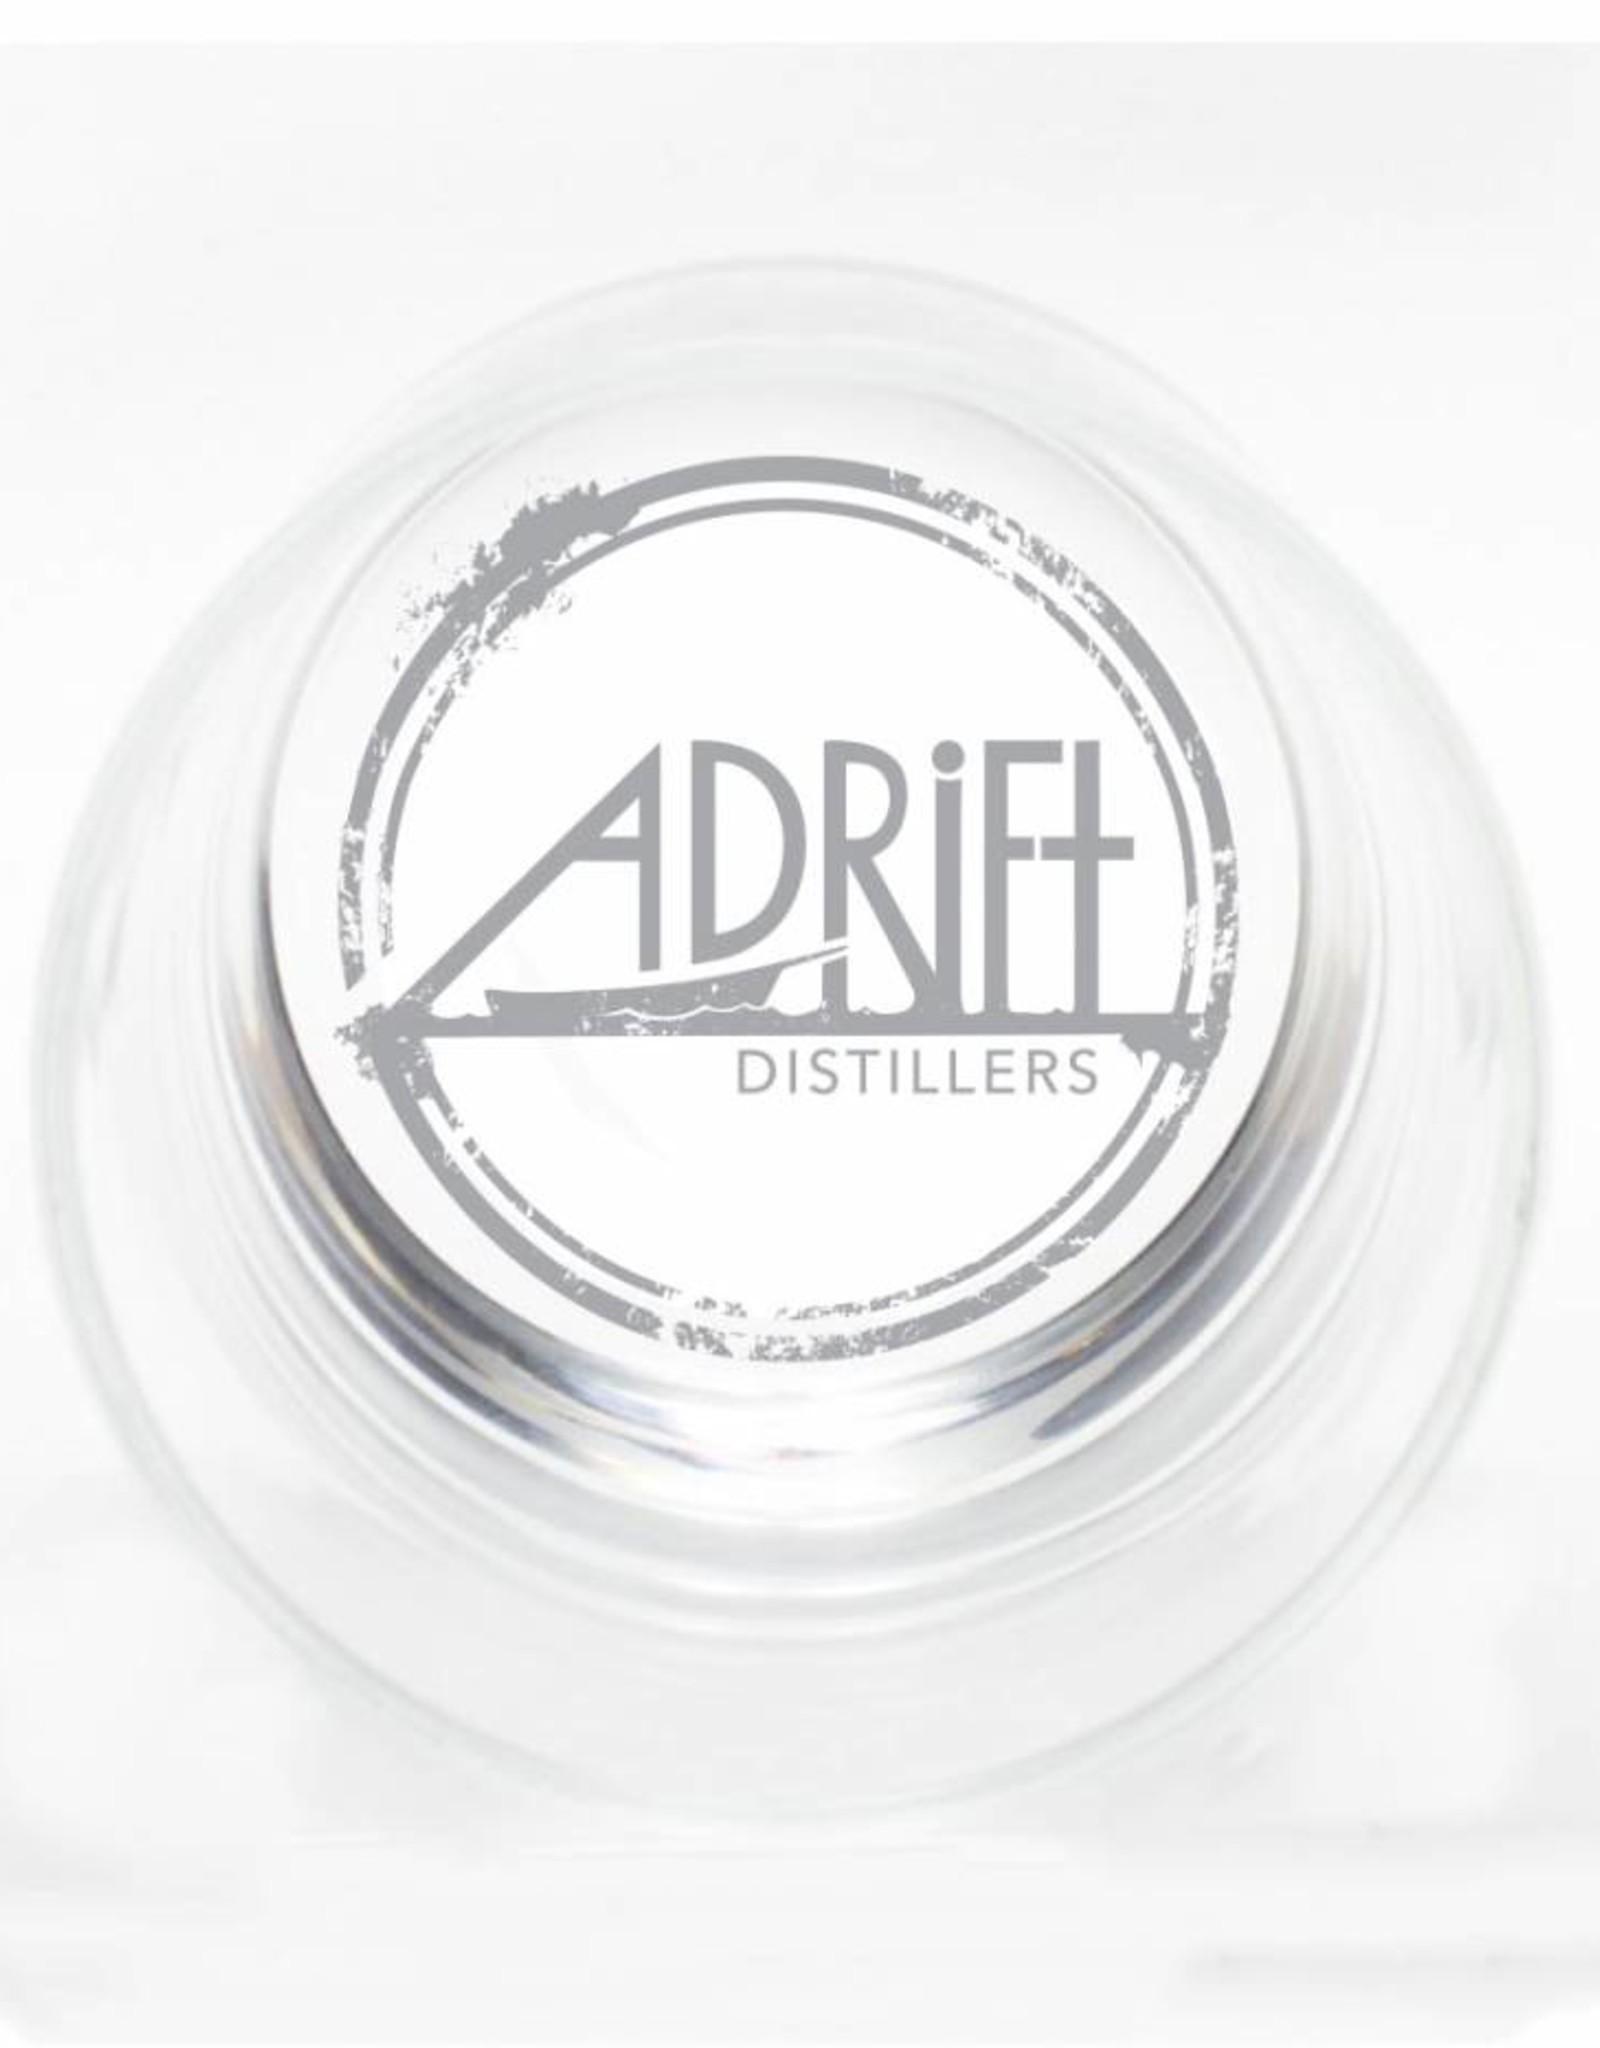 Adrift Distillers Etched Rocks Glass